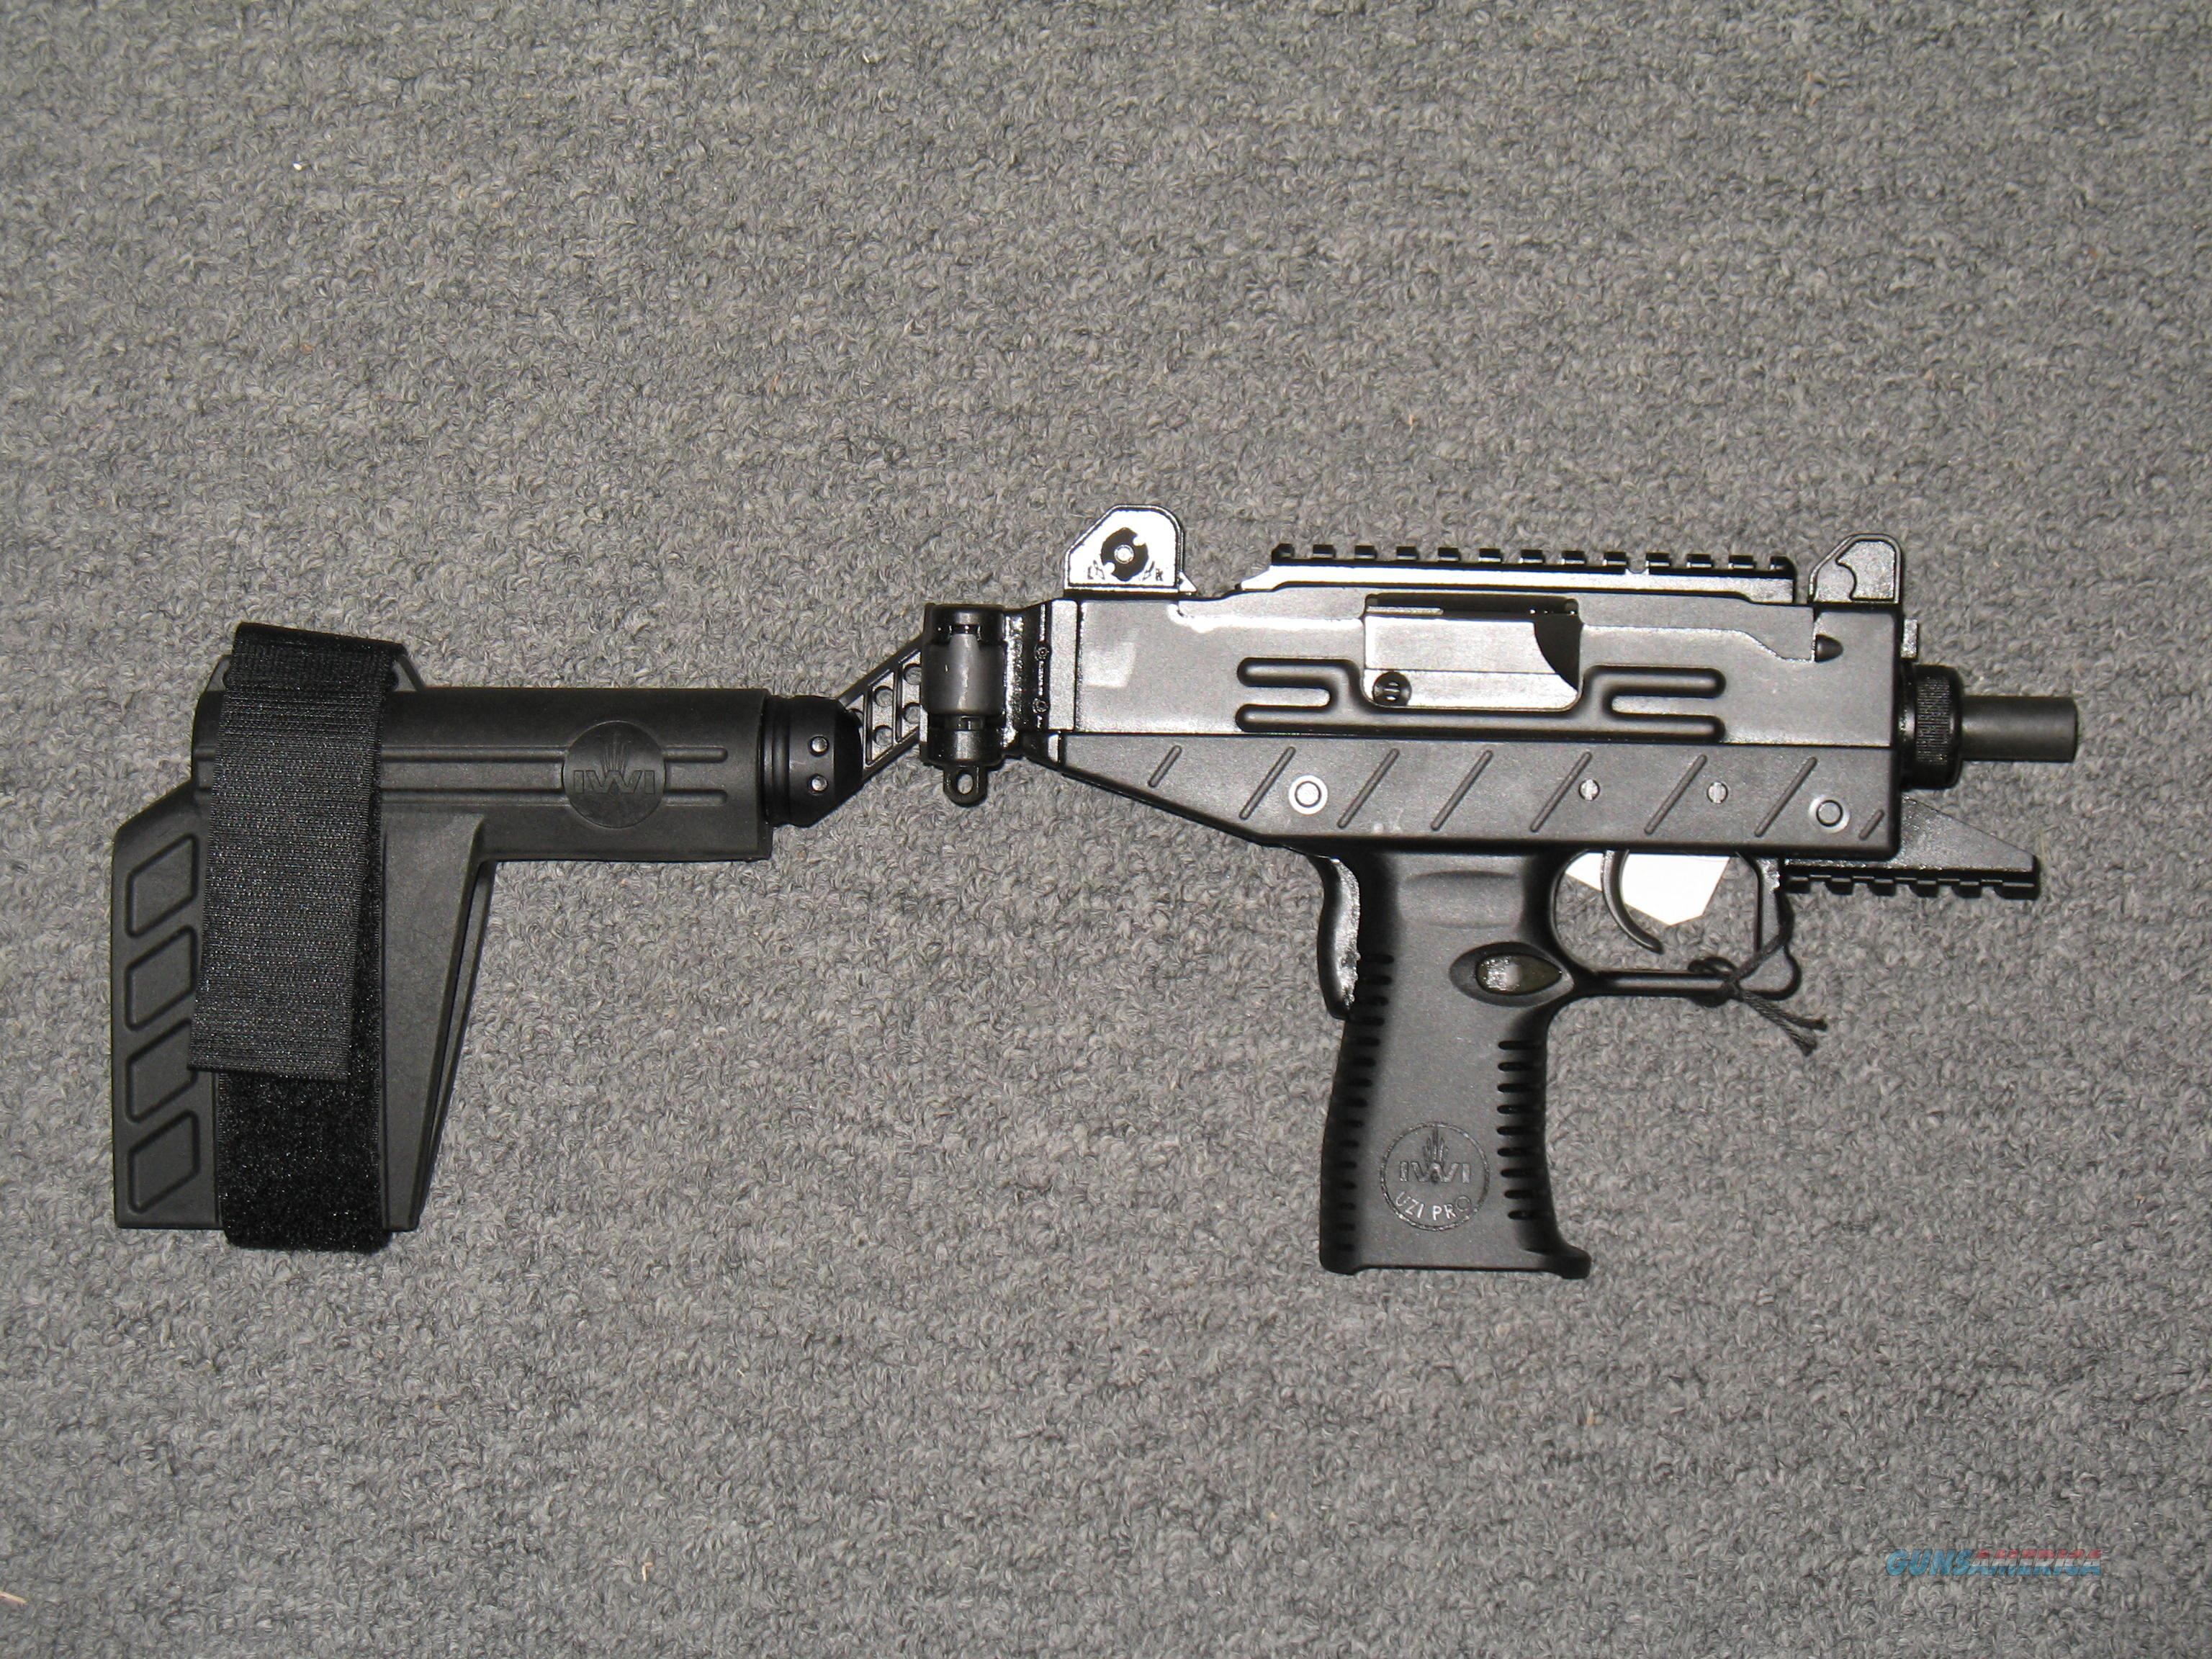 IWI Uzi Pro Pistol 9mm for sale